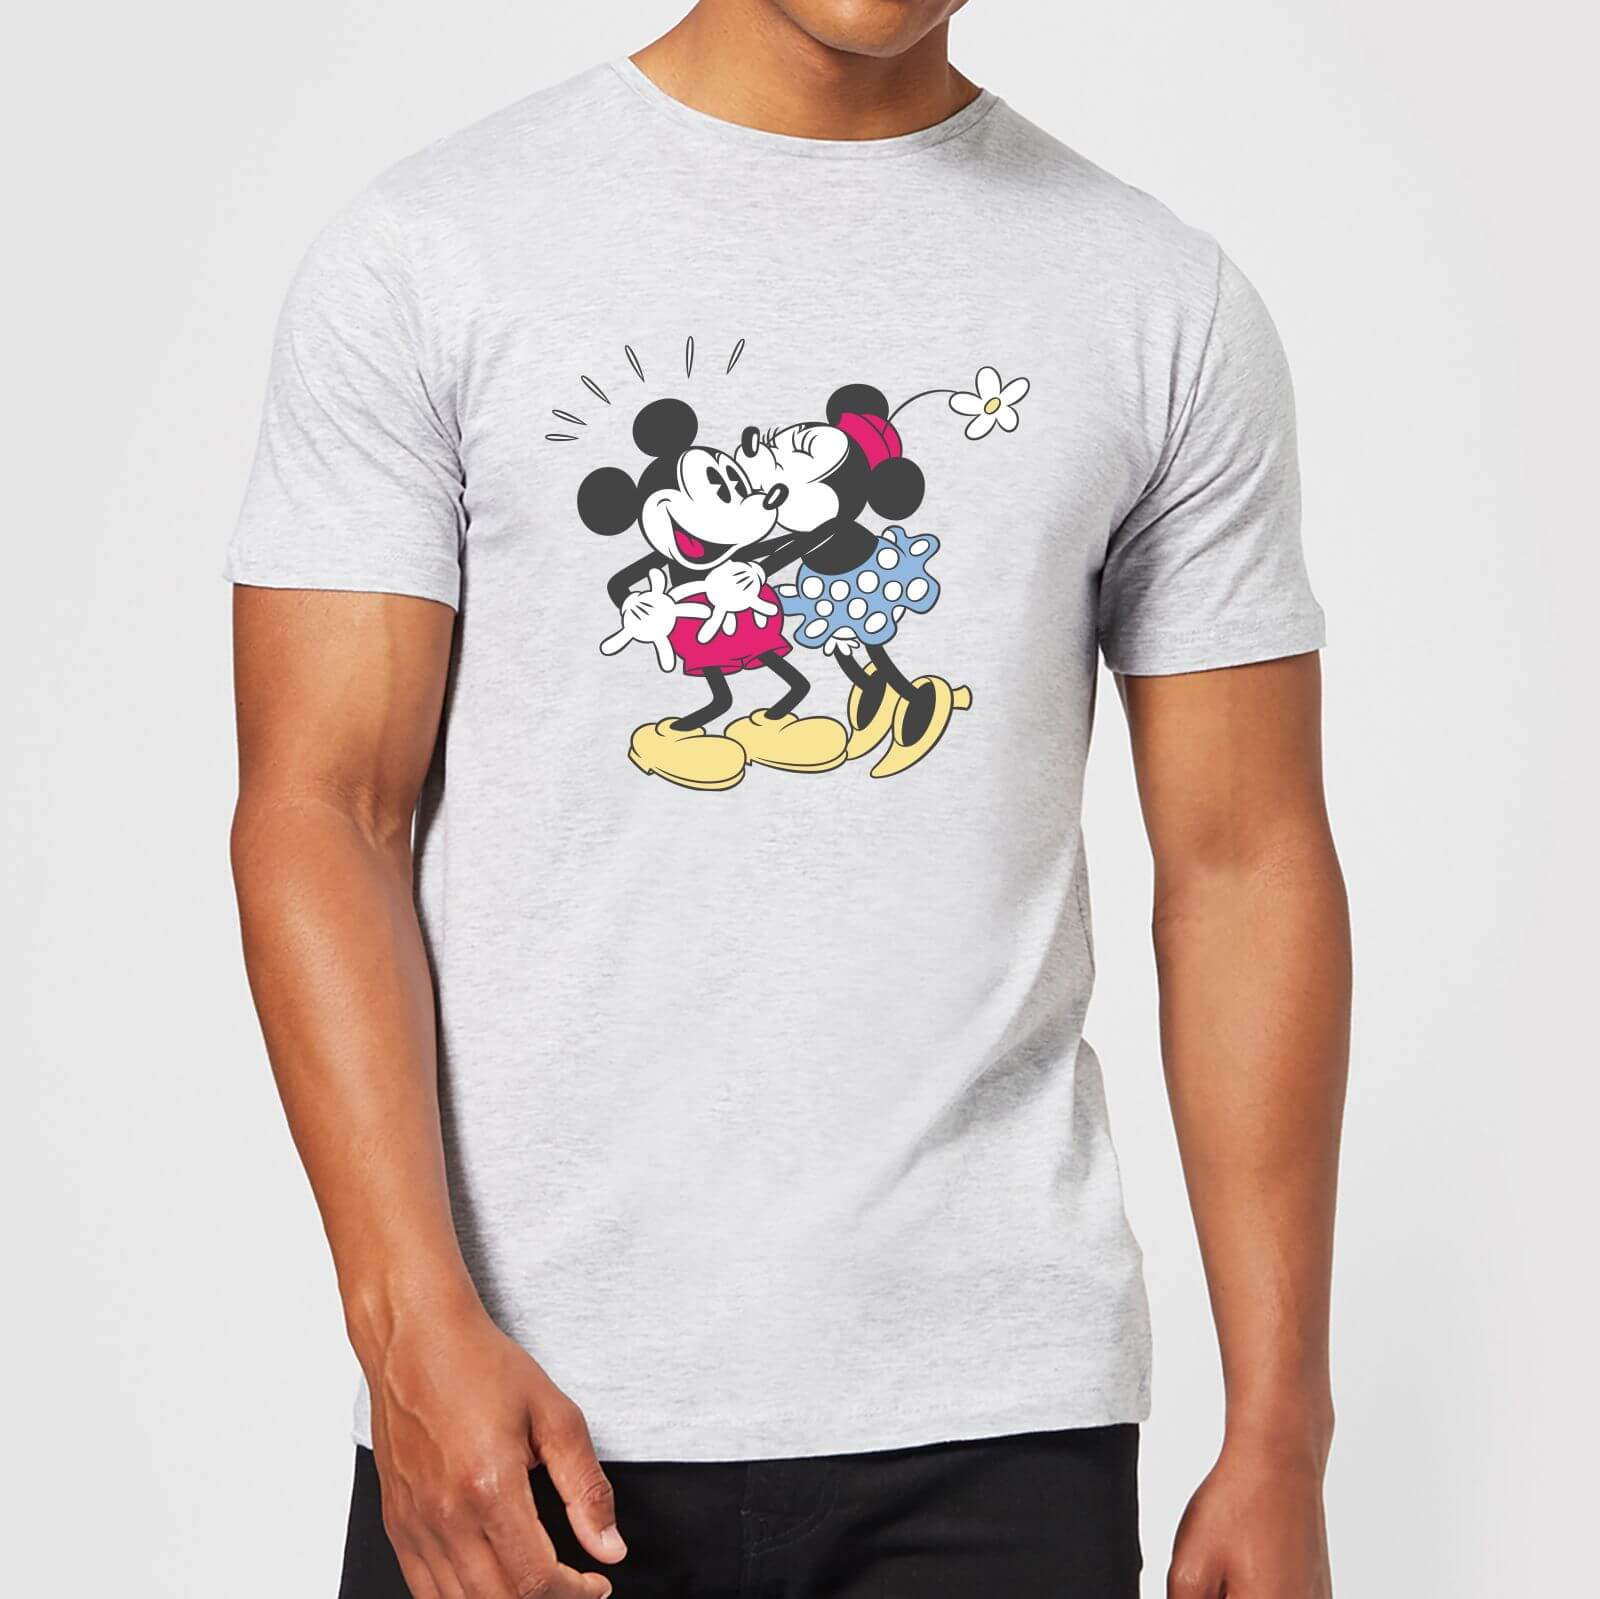 Disney Disney Mickey Mouse Minnie Kiss T-Shirt - Grey - 5XL - Grey